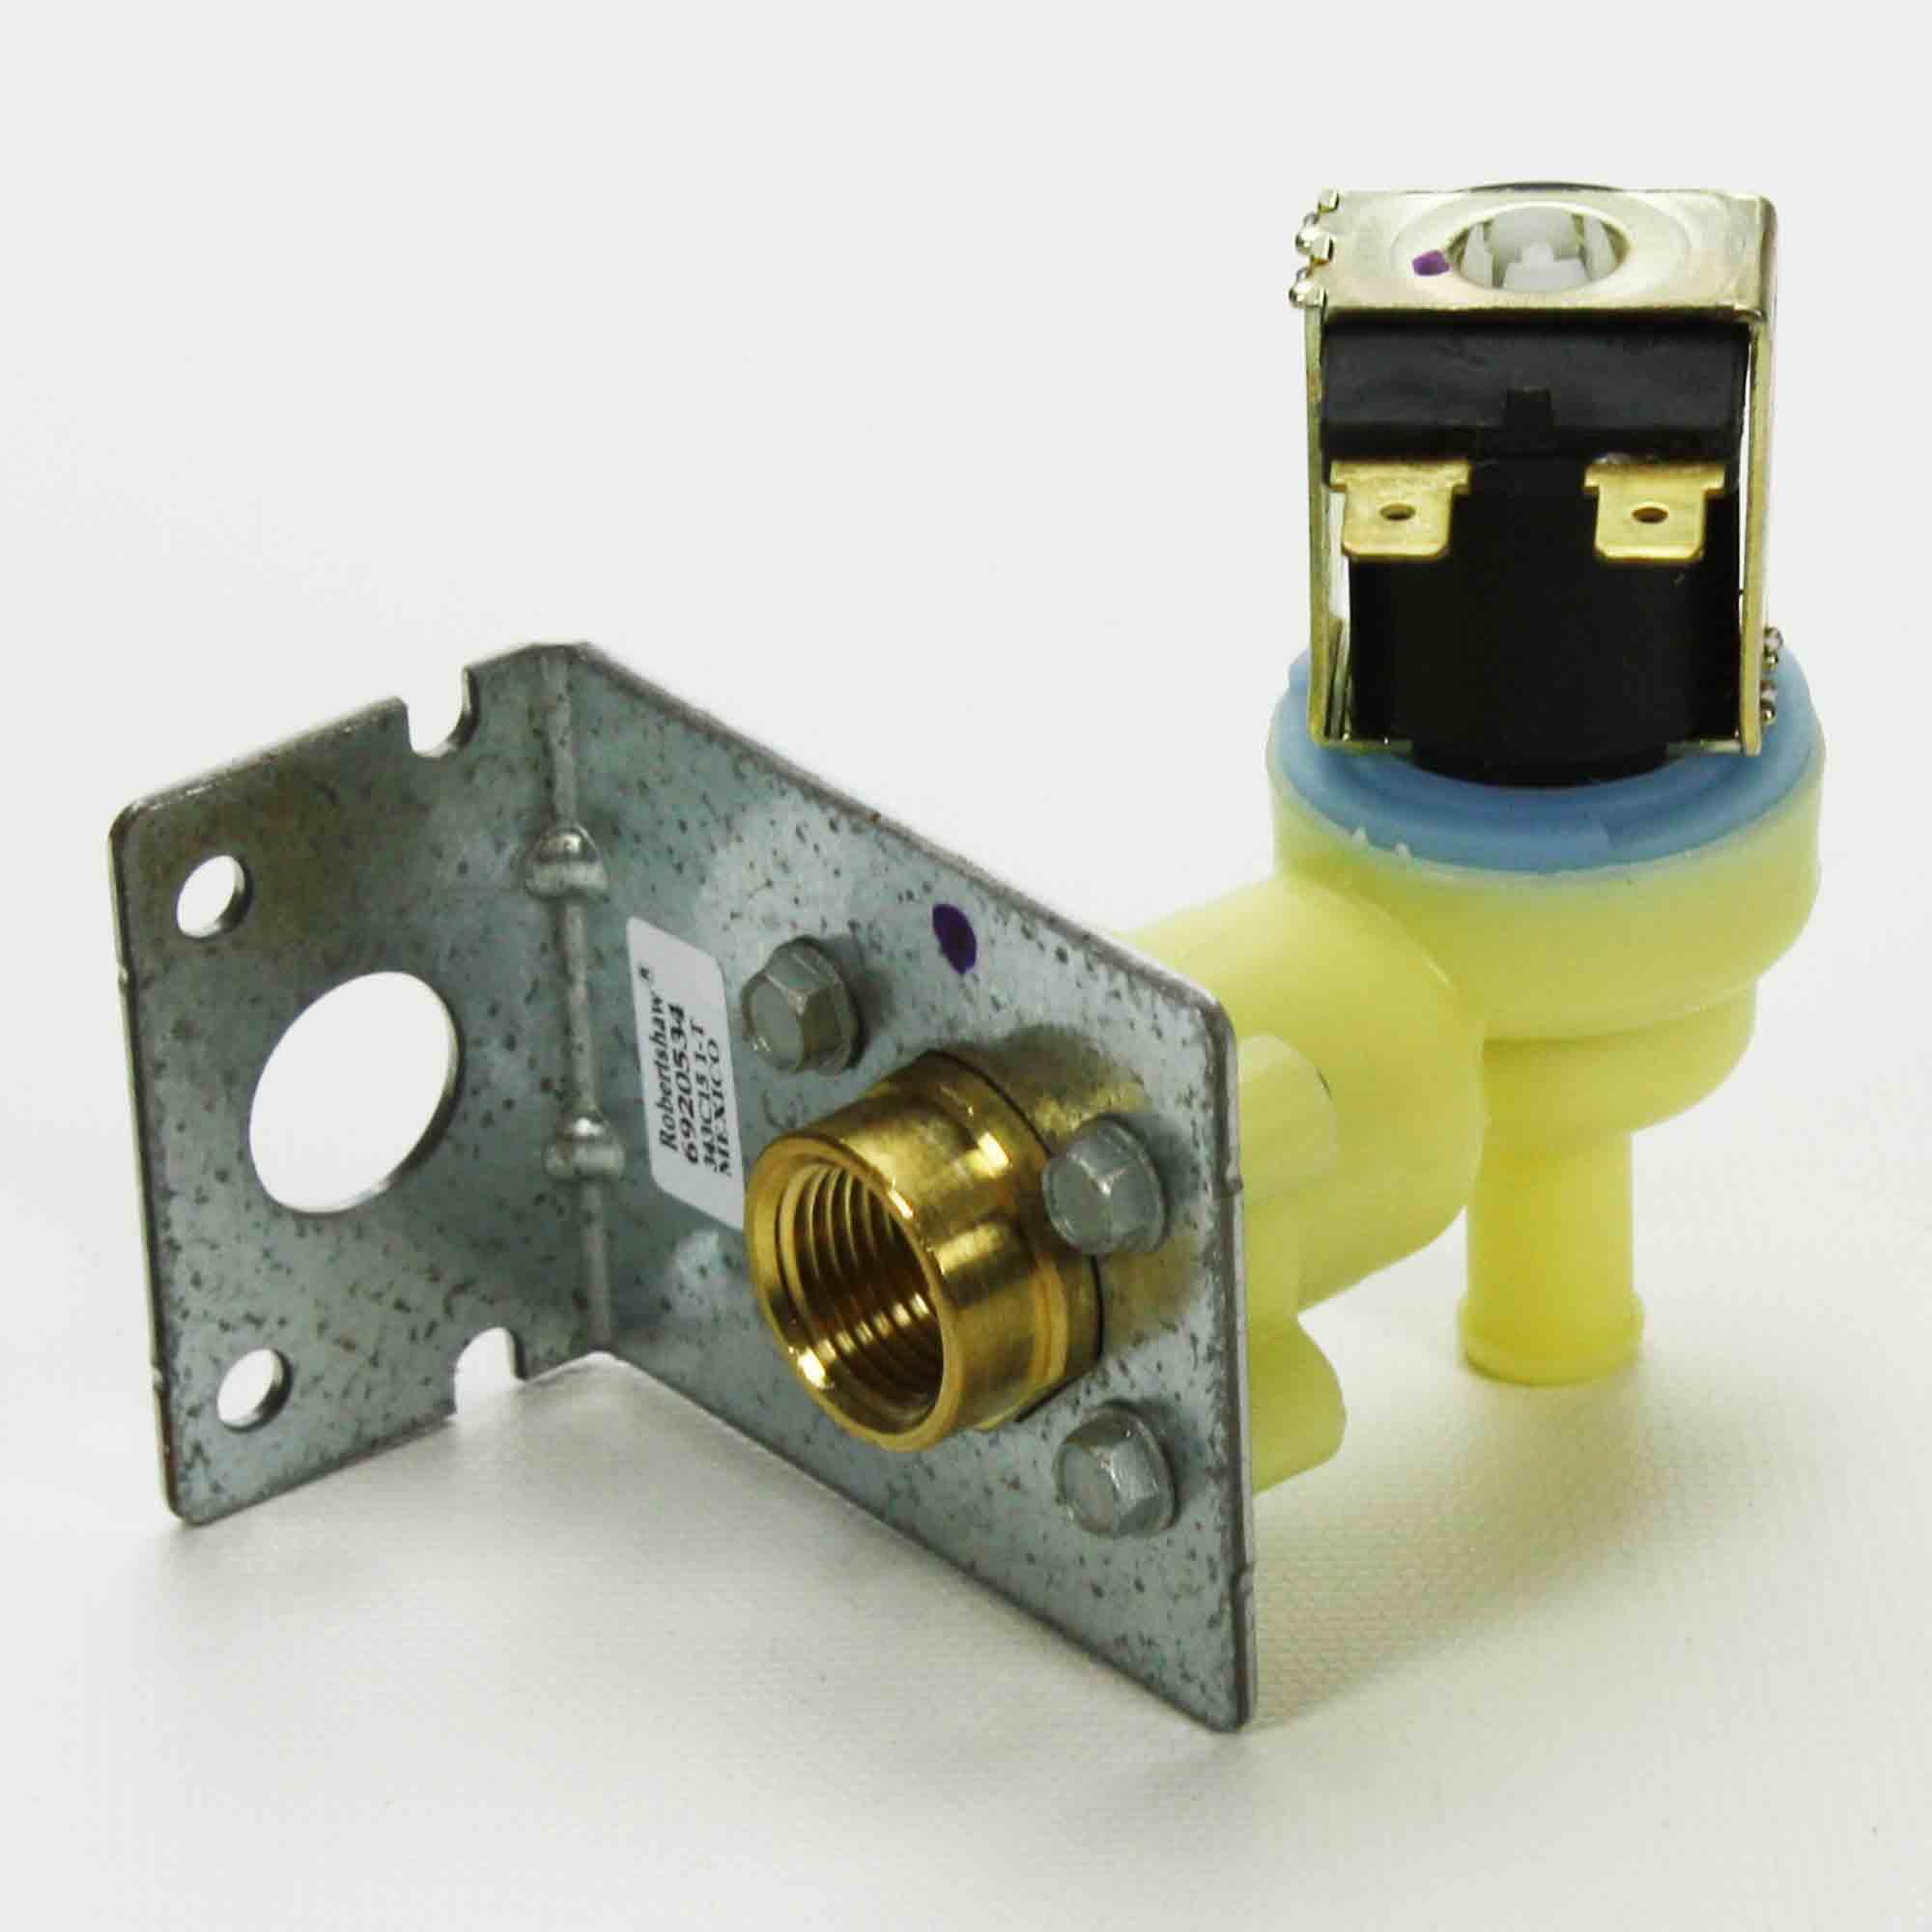 W11082871 Whirlpool Dishwasher Water Inlet Valve Ebay Maytag Mdb4651awb Parts Diagram